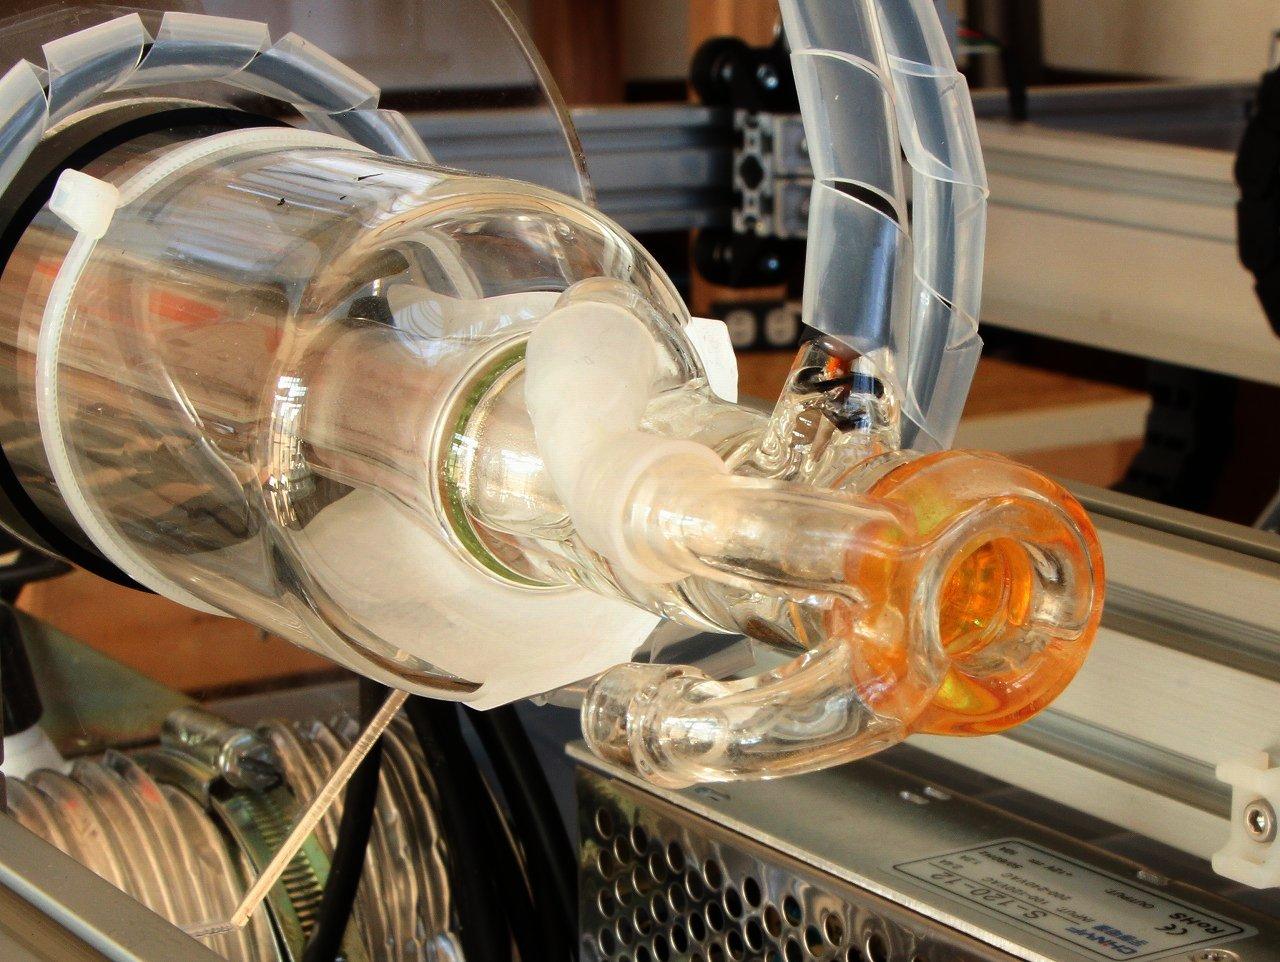 CO2レーザー加工機(カッター) 構造編 レーザー管の画像